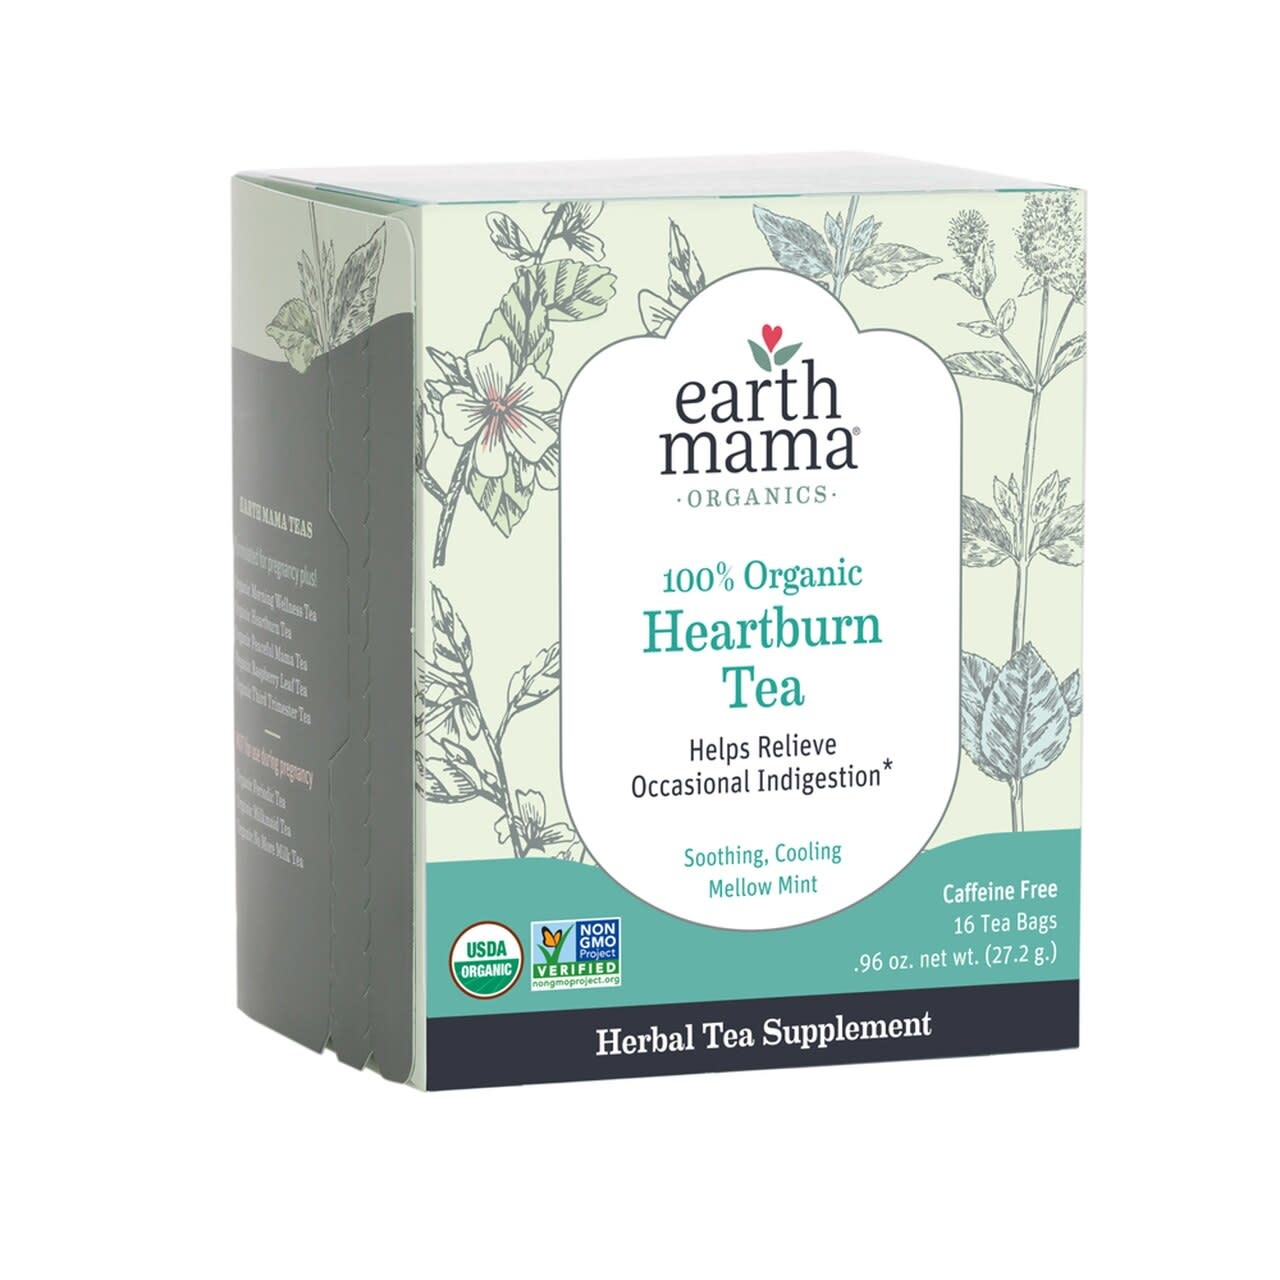 Earth Mama Organics Organic Heartburn Tea